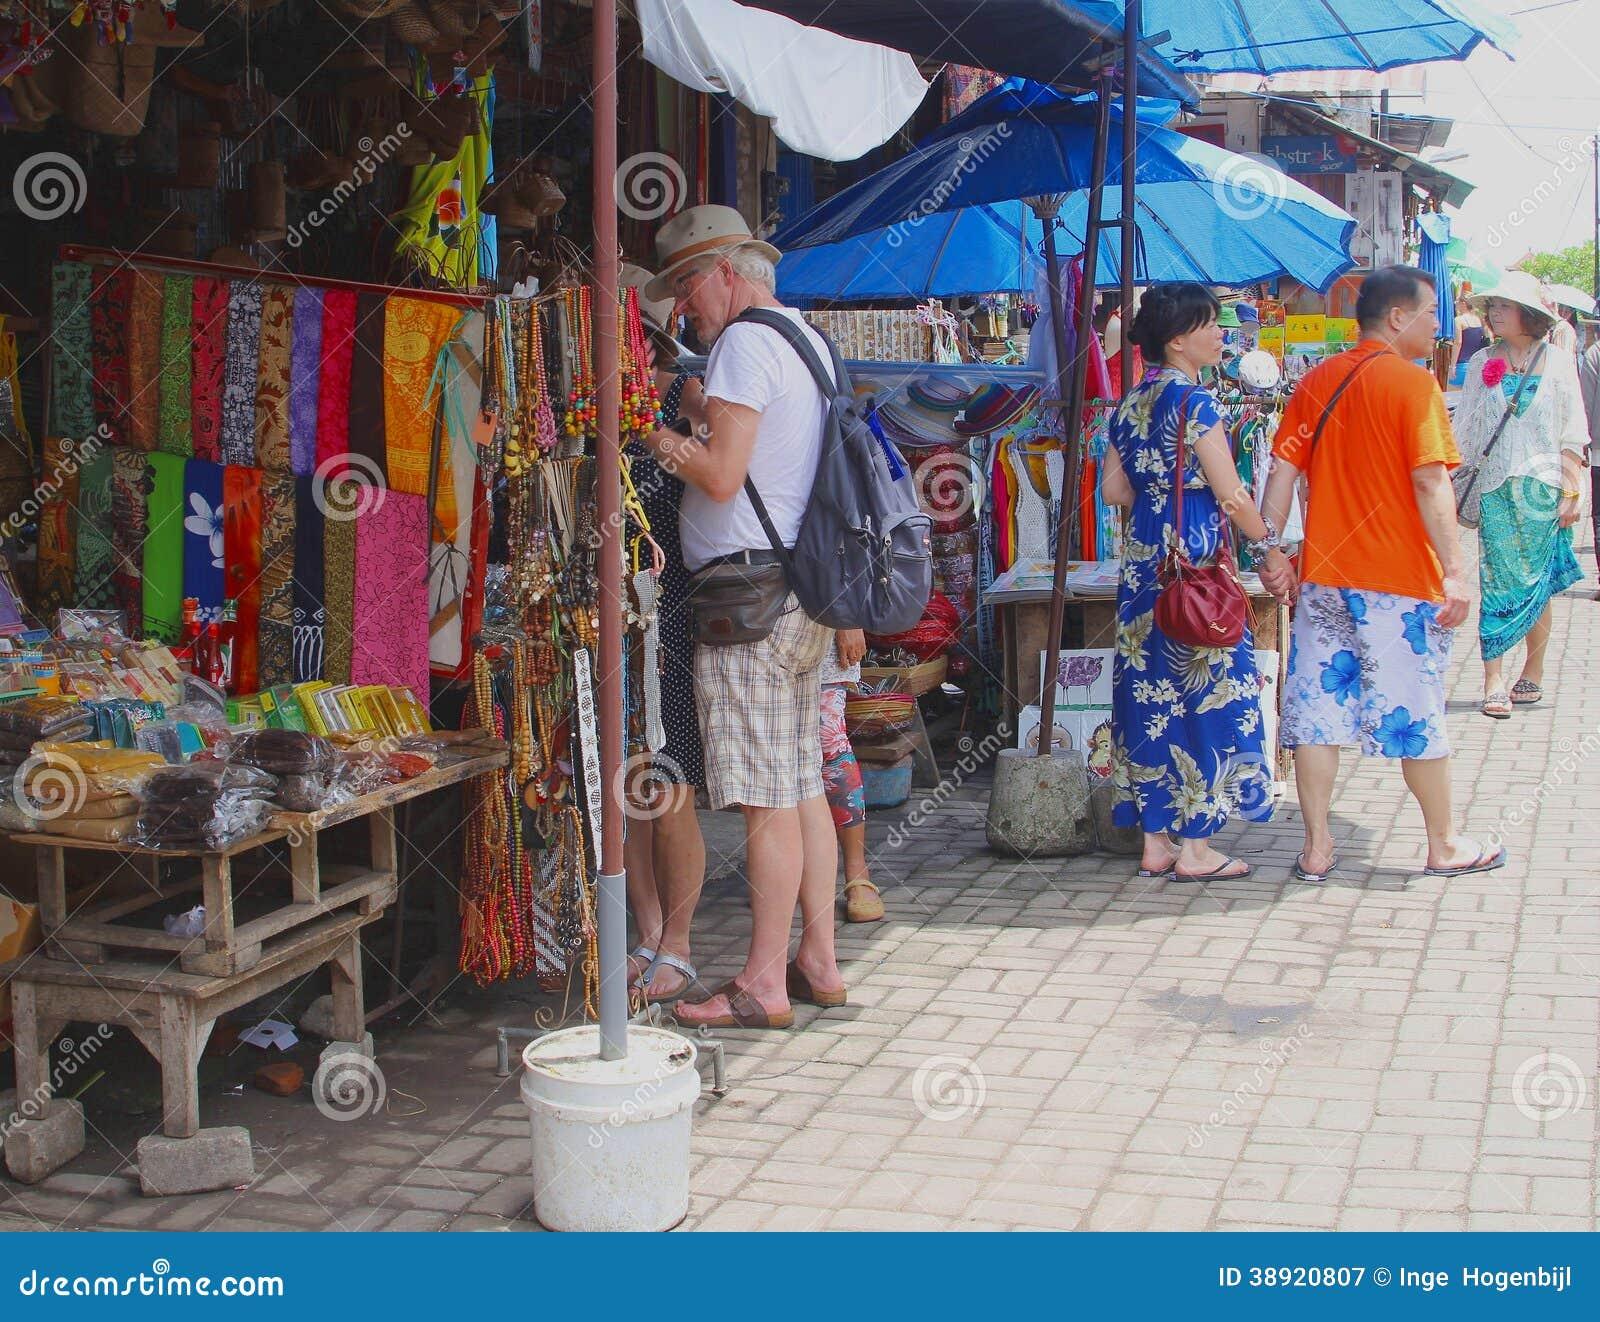 Shopping At The Arts Market In Ubud, Bali Editorial